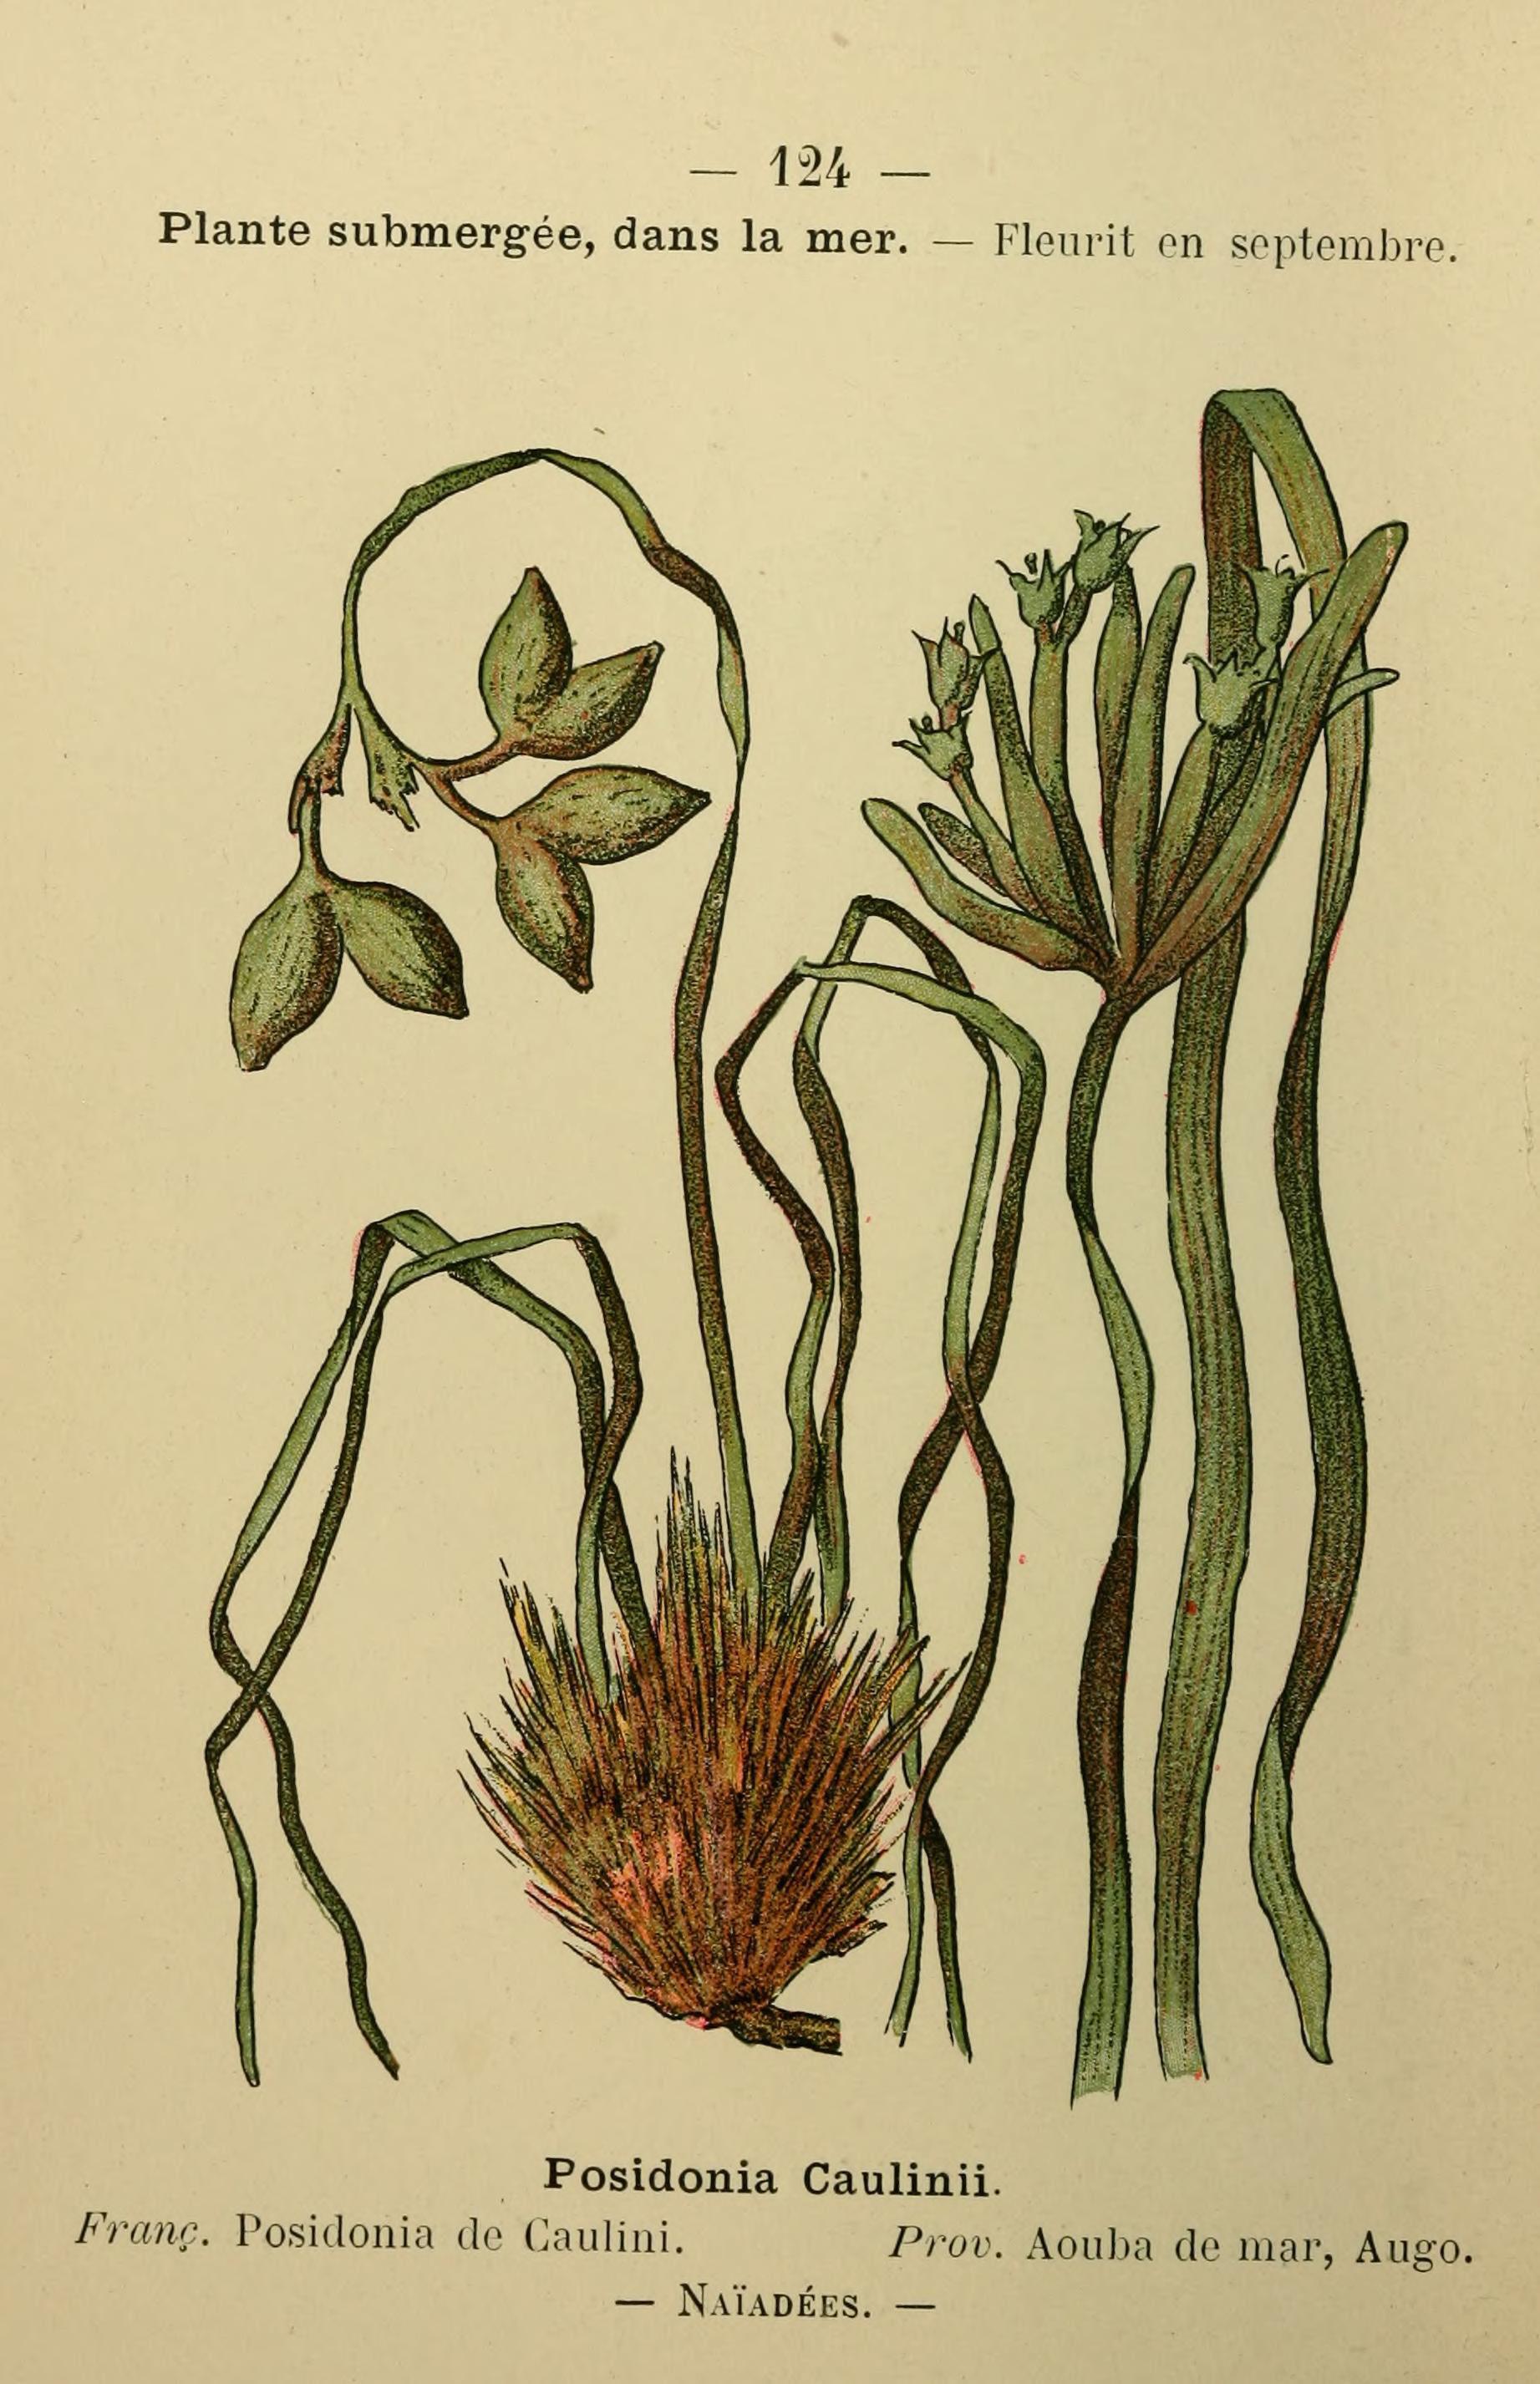 Image of Neptune grass